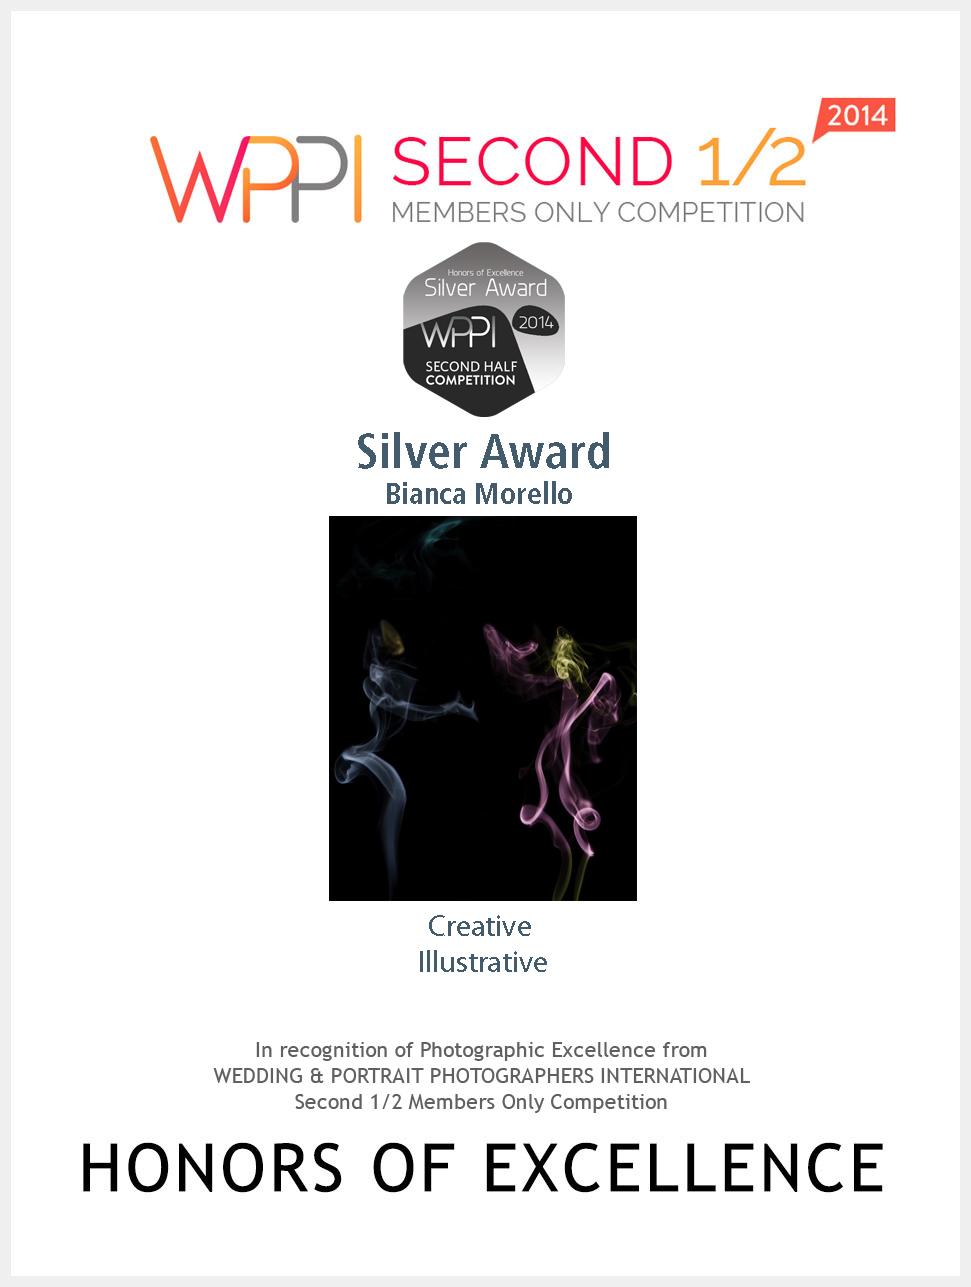 WPPIawards_2014SecondHalf-silvercreative.jpg